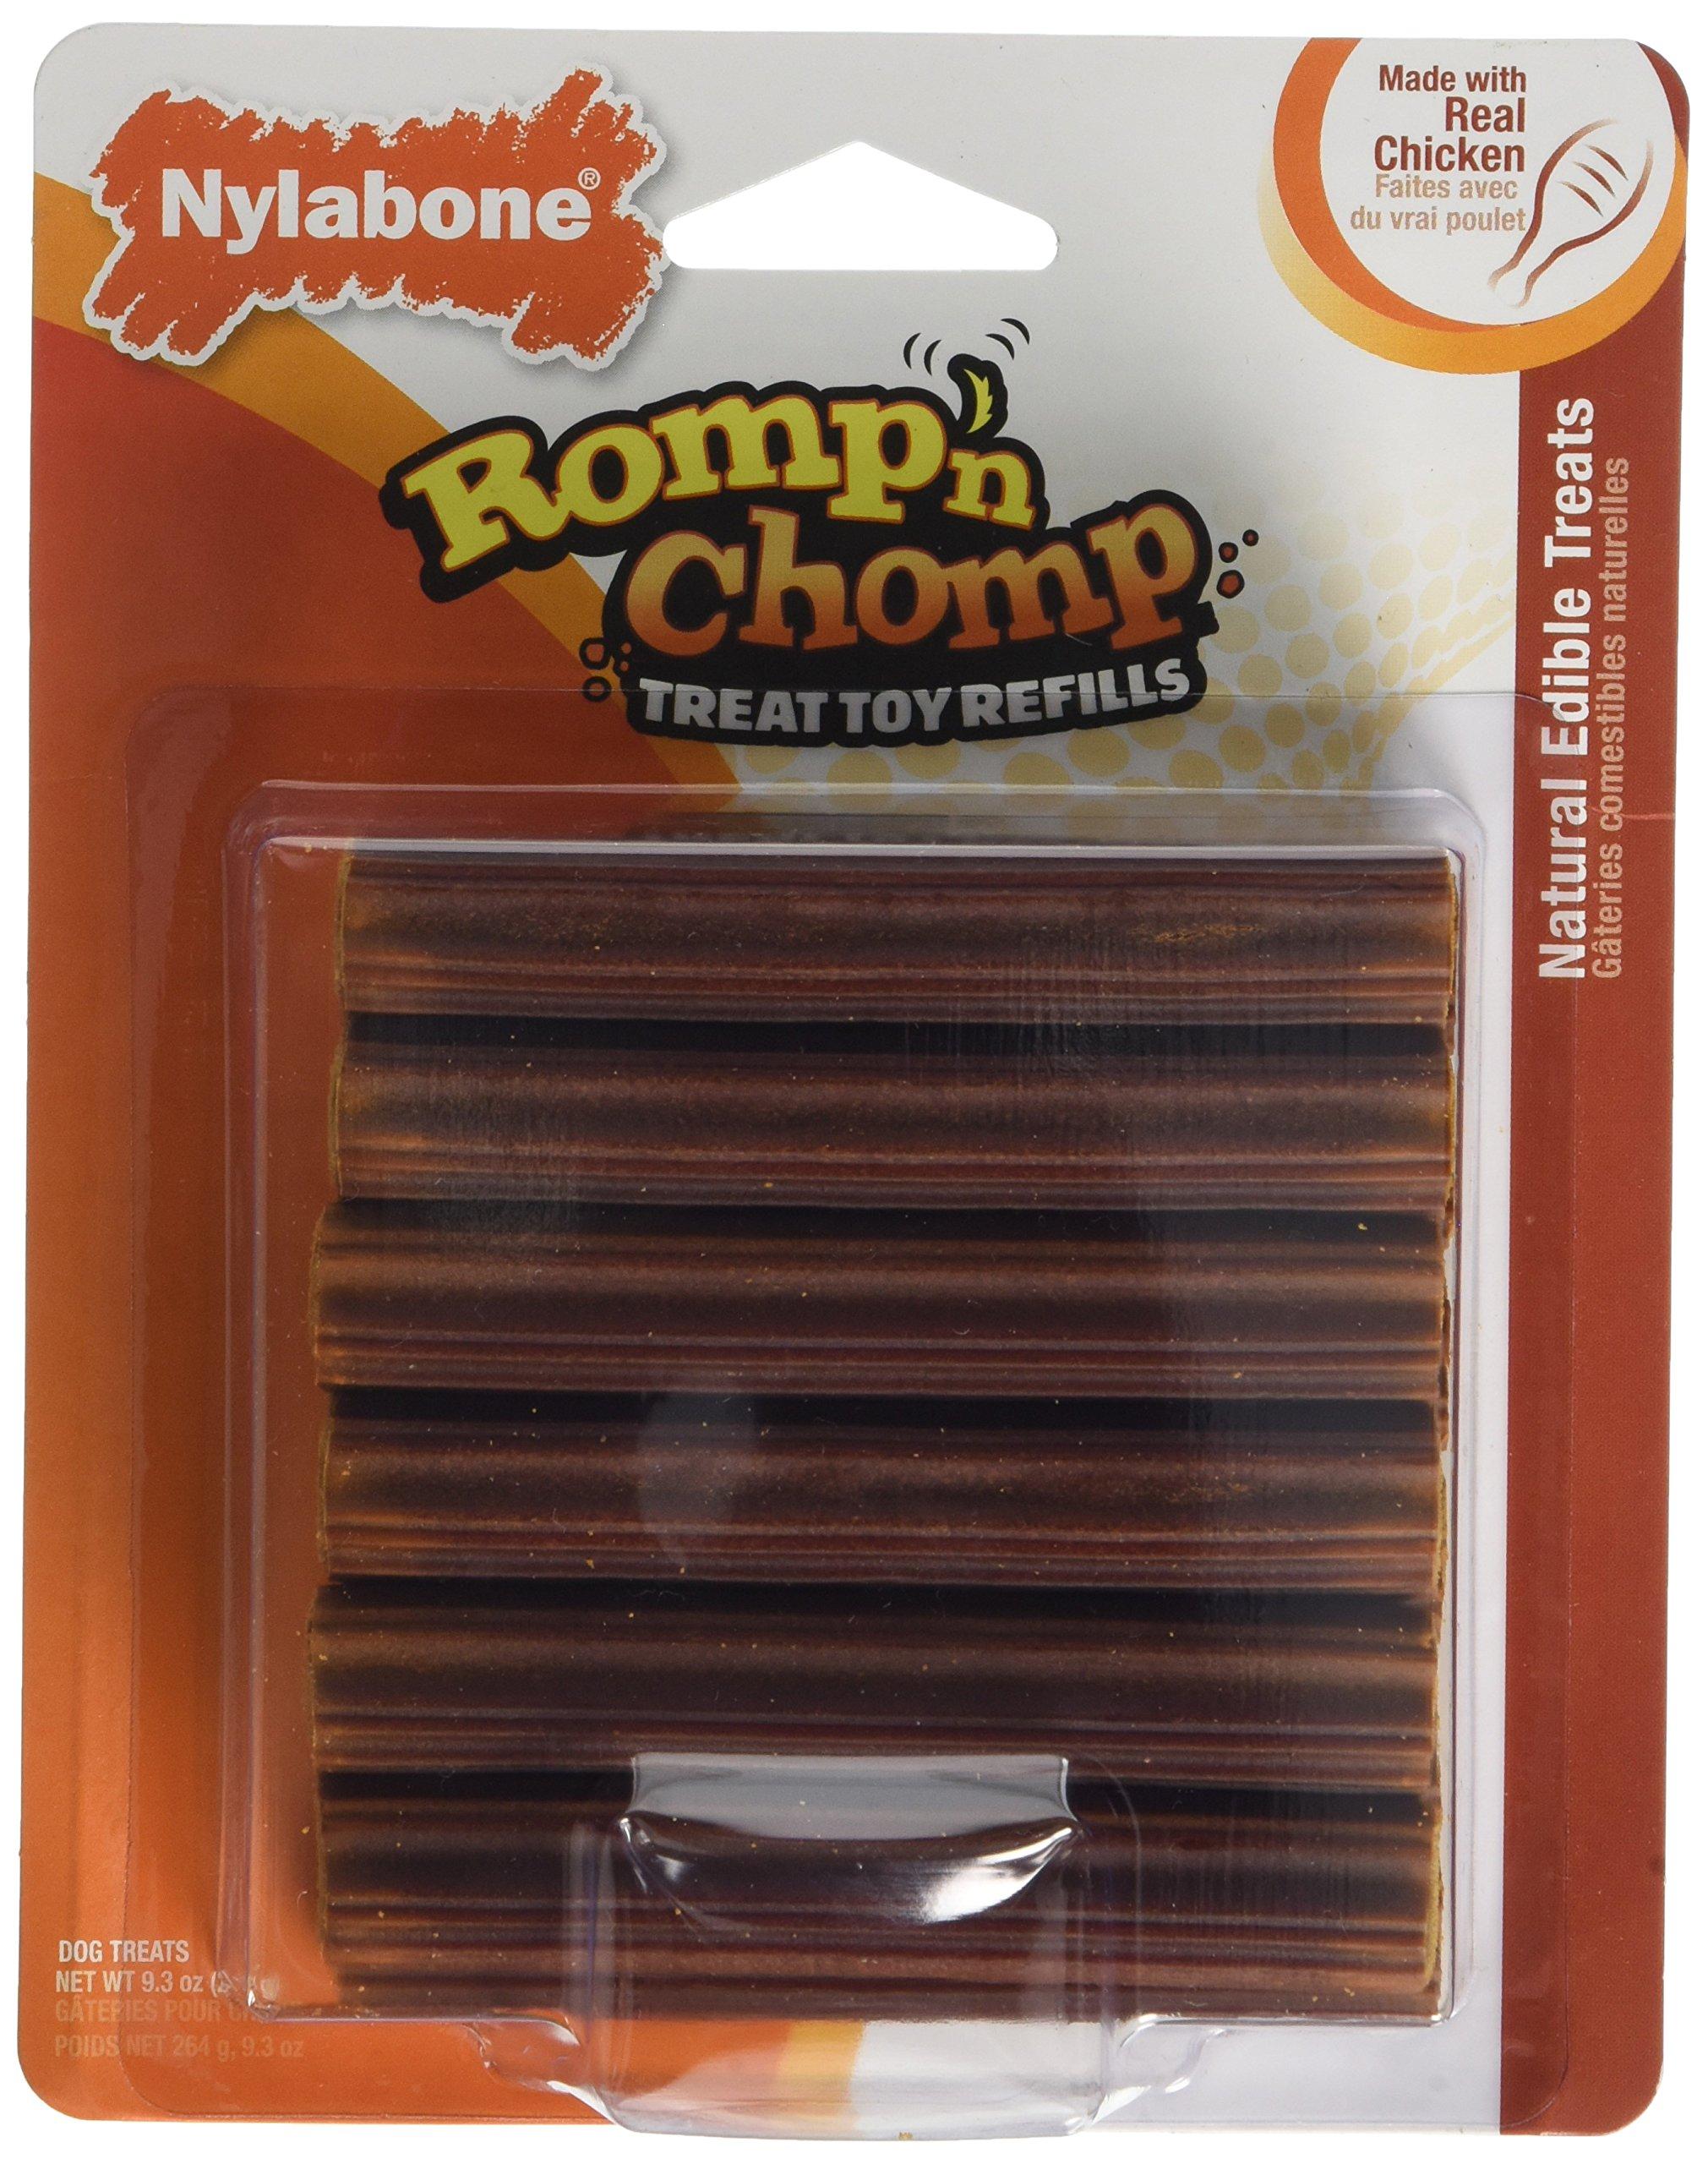 Nylabone Romp 'N Chomp Interactive Treat Toy Refill, 12 Count